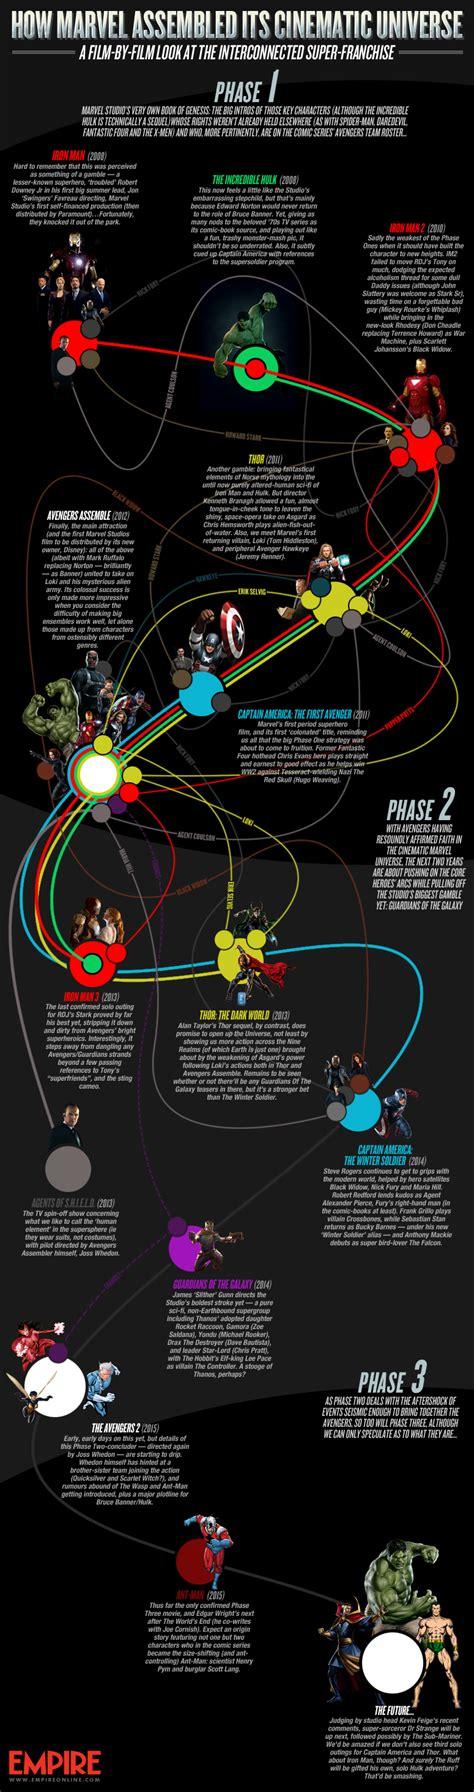 marvel film universe wikia how marvel studios built its cinematic universe